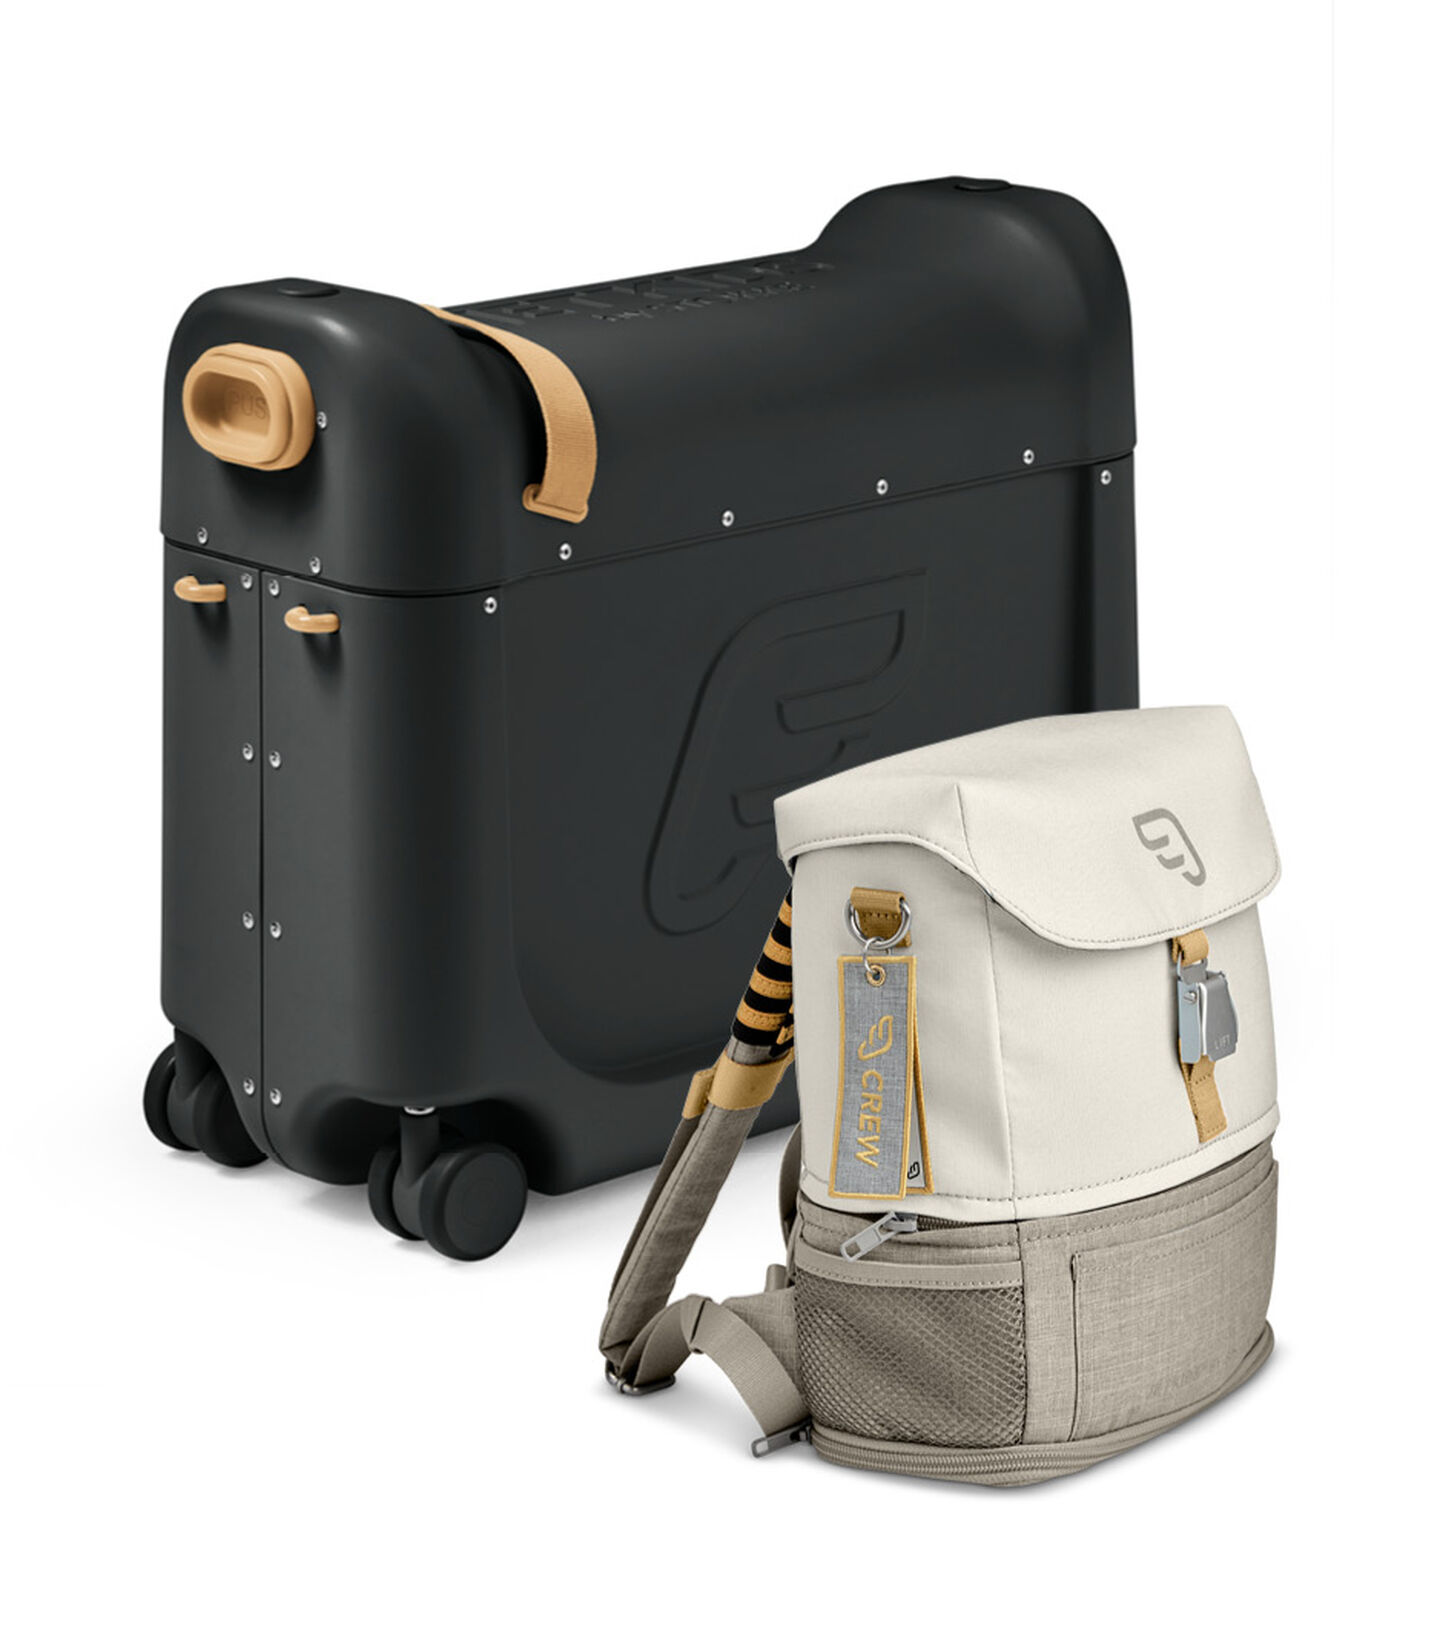 BedBox™ + Crew BackPack™ rejse pakke Black /White, Black / White, mainview view 2